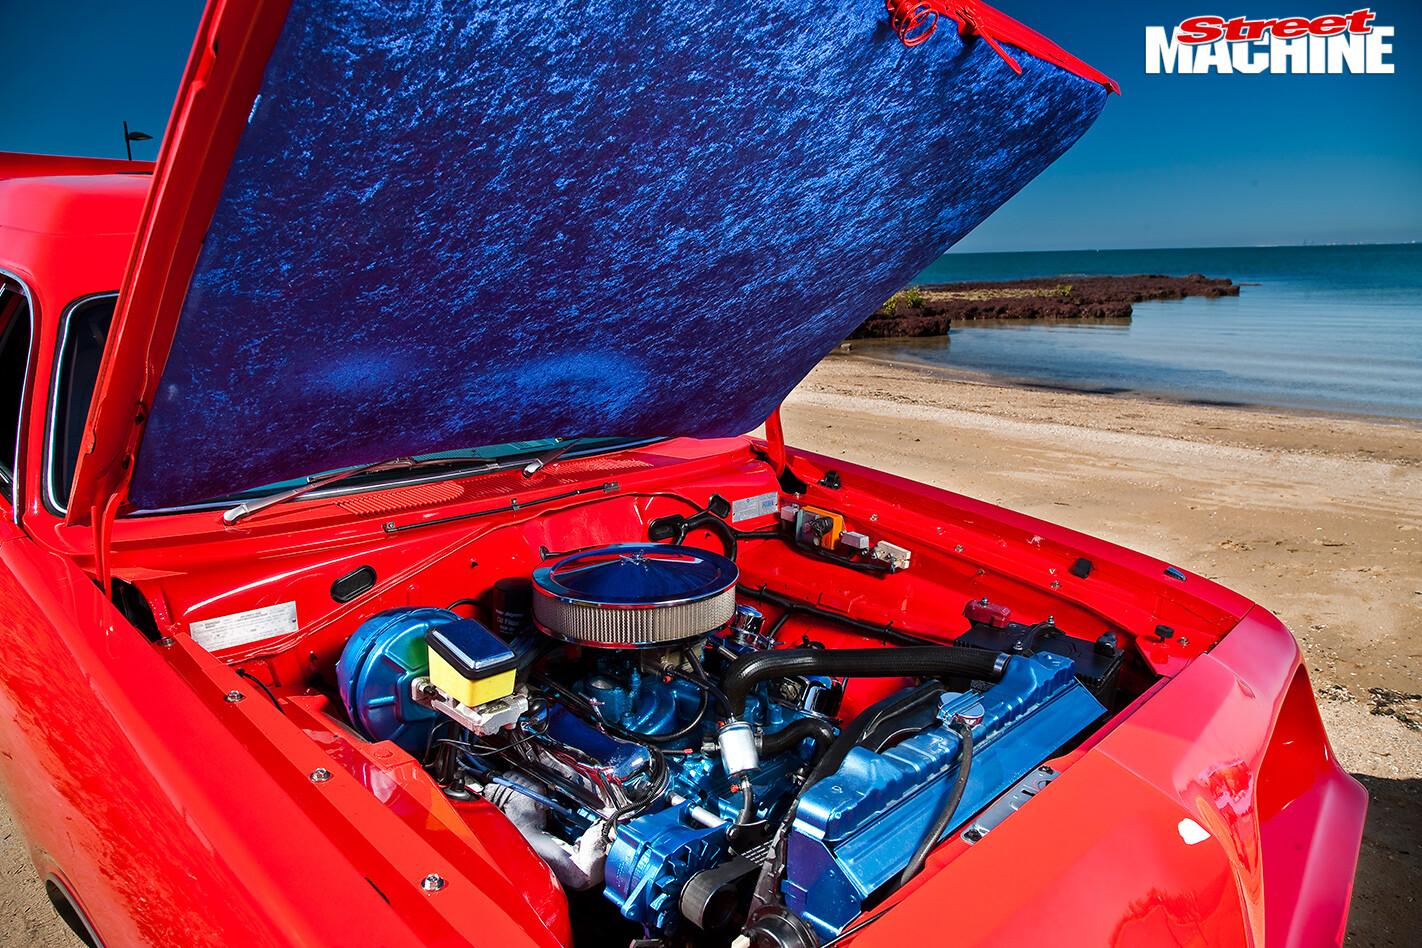 Chrysler -panel -van -engine -bay -2